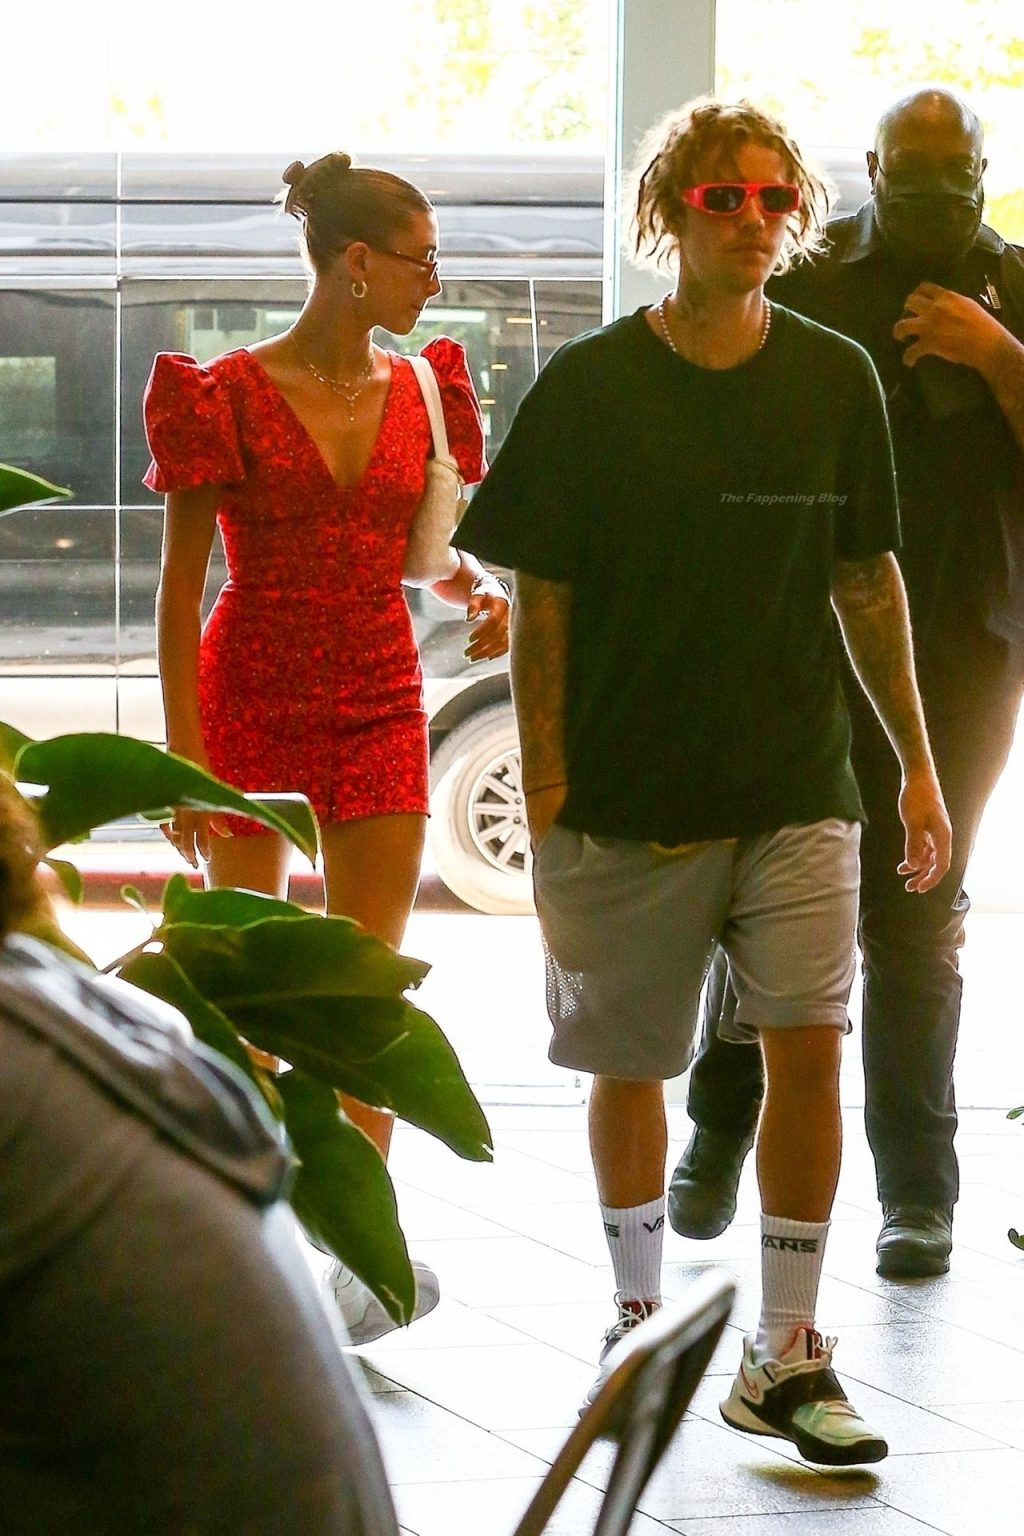 Hailey & Justin Bieber are Seen During a Miami Shopping Trip (32 Photos)